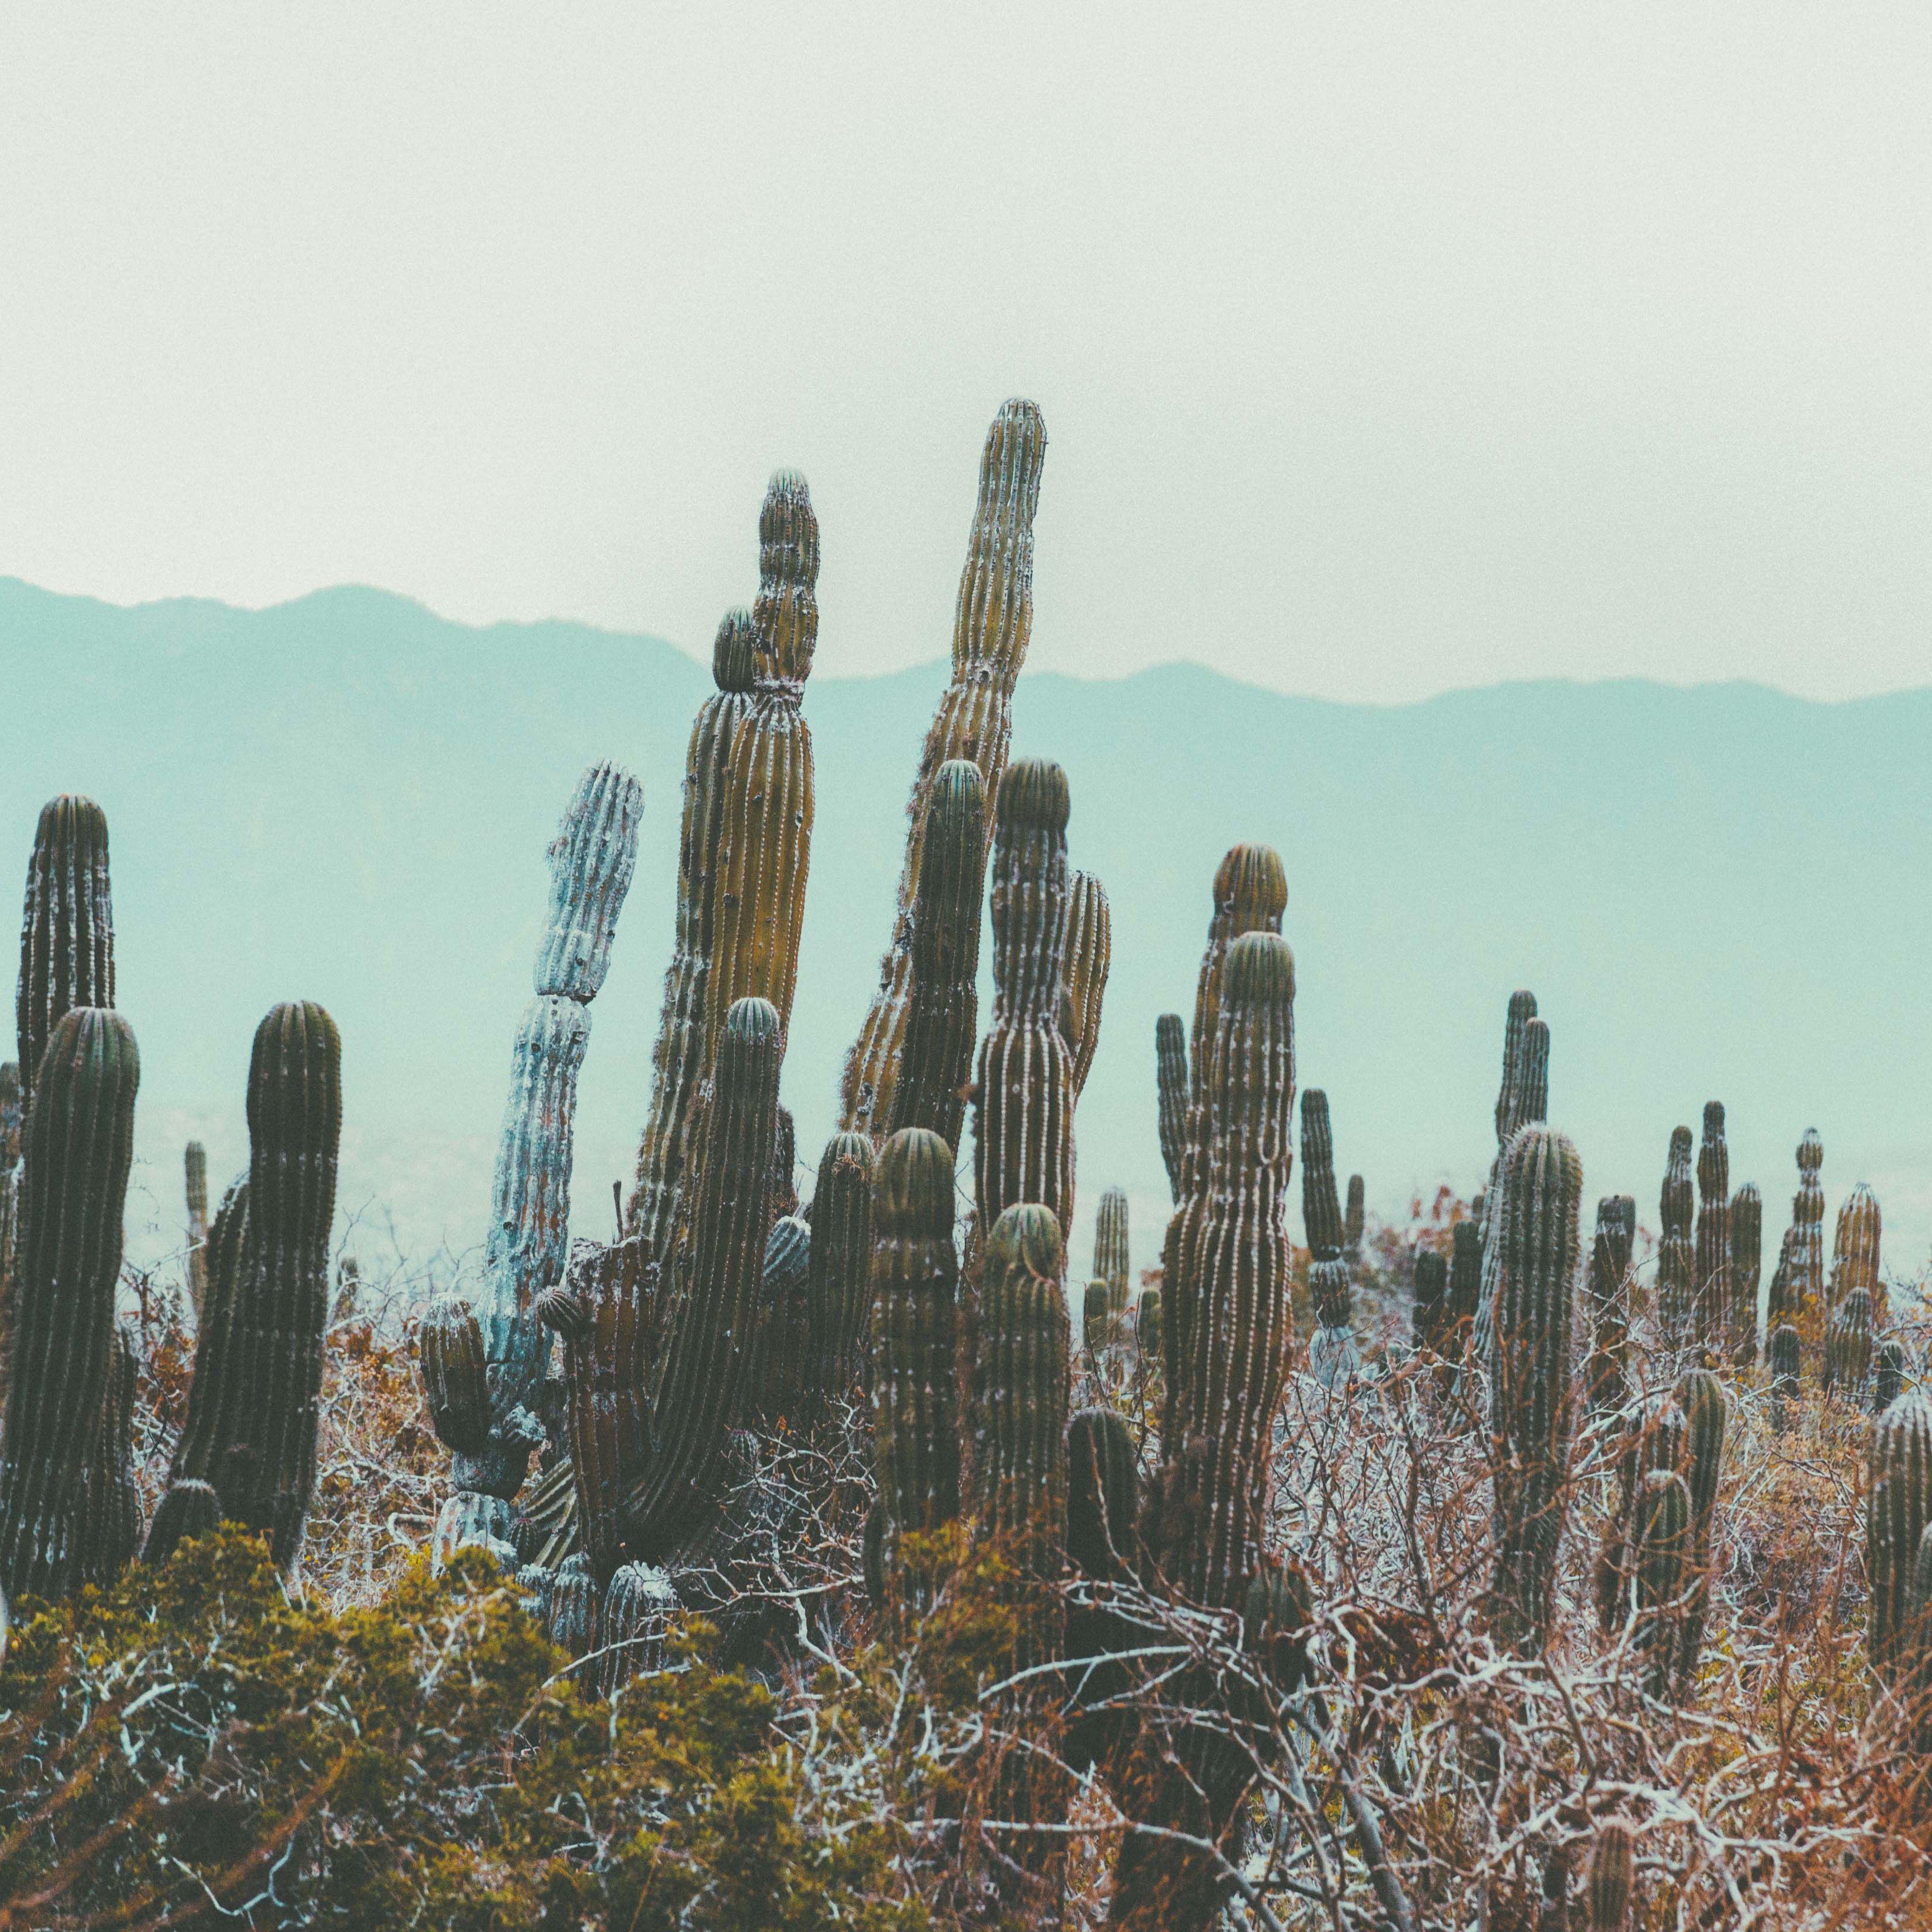 towering cacti & high temps || desert vibes